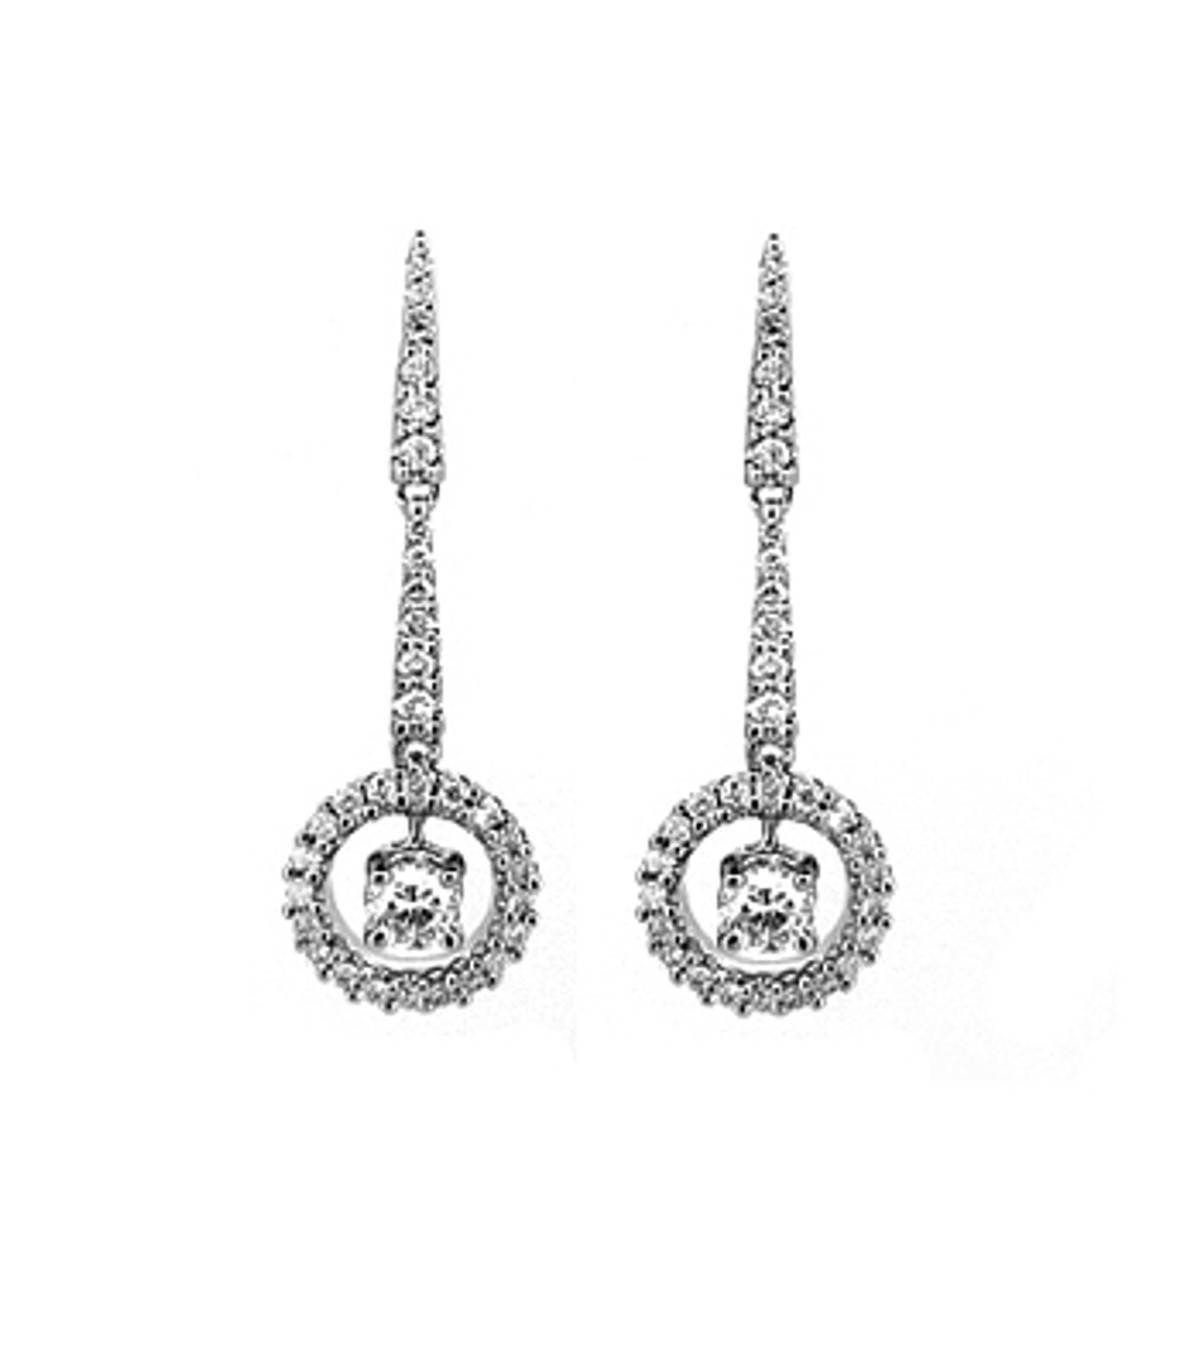 18k white gold brilliant cut diamond cluster drop earringsDETAILSCarat: diamond total weight 0.68cts FIT & SIZEwidth  0.9cmdrop  2.8cm